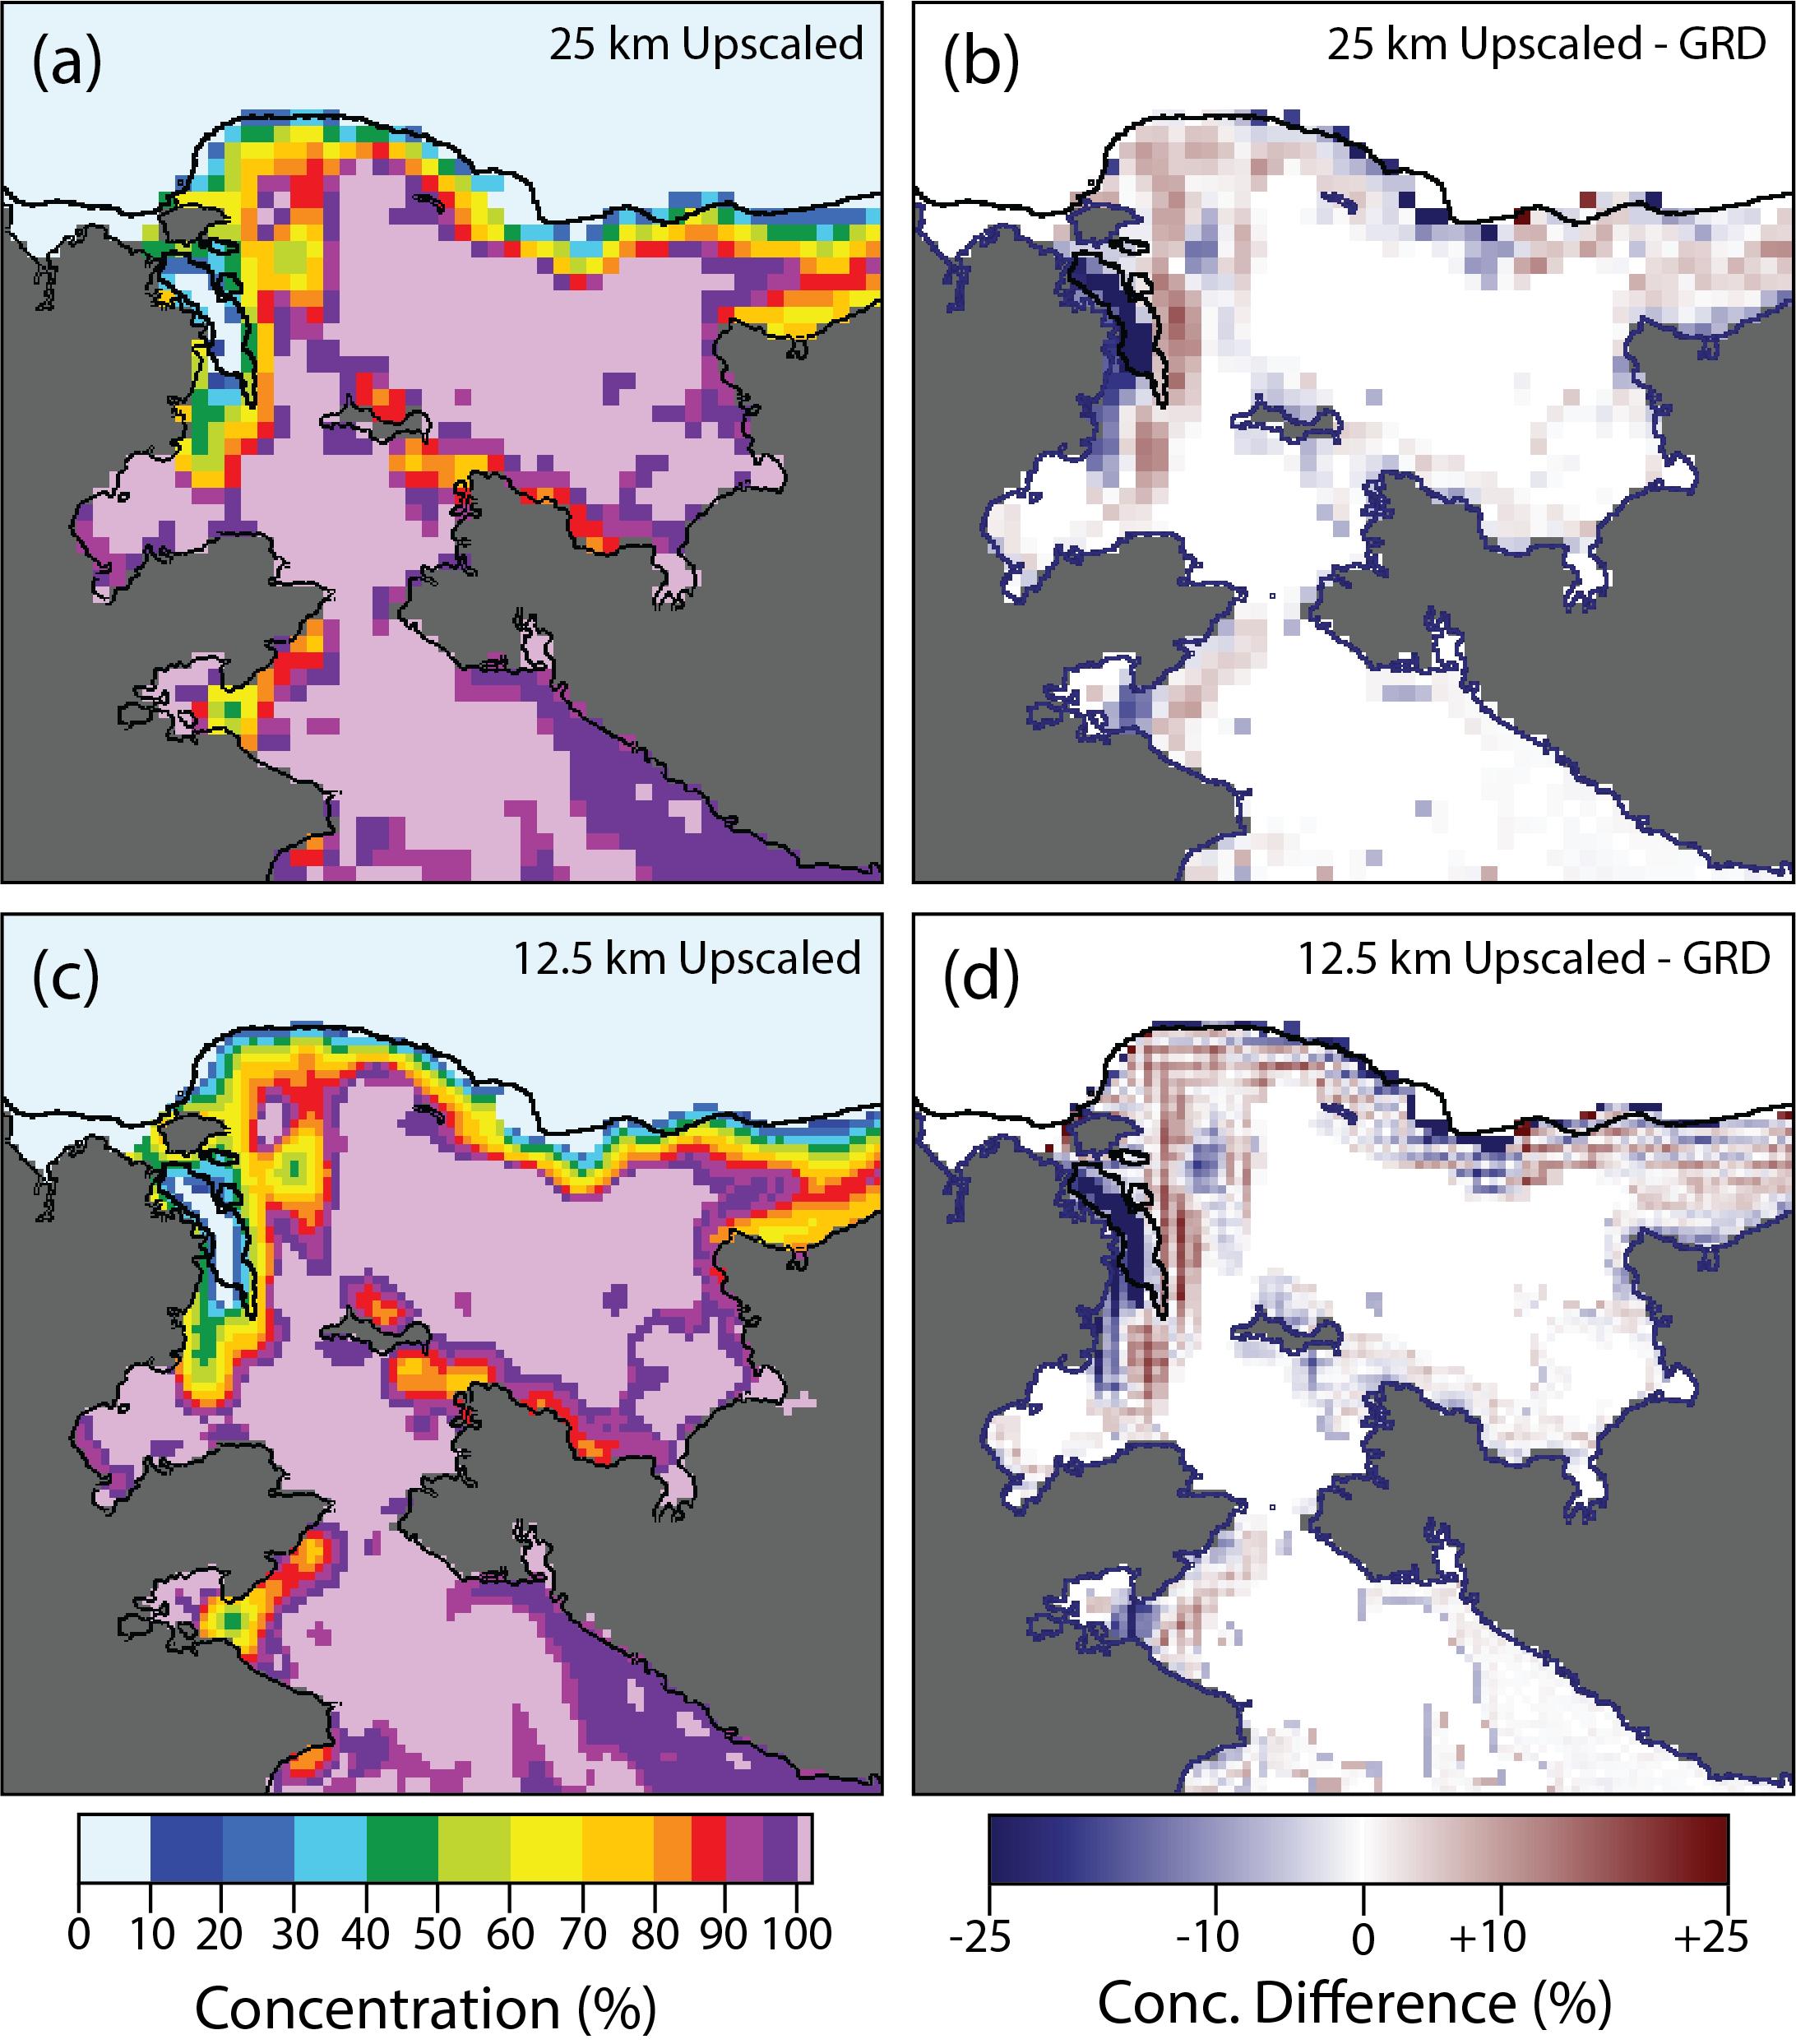 Enhanced sea ice concentration